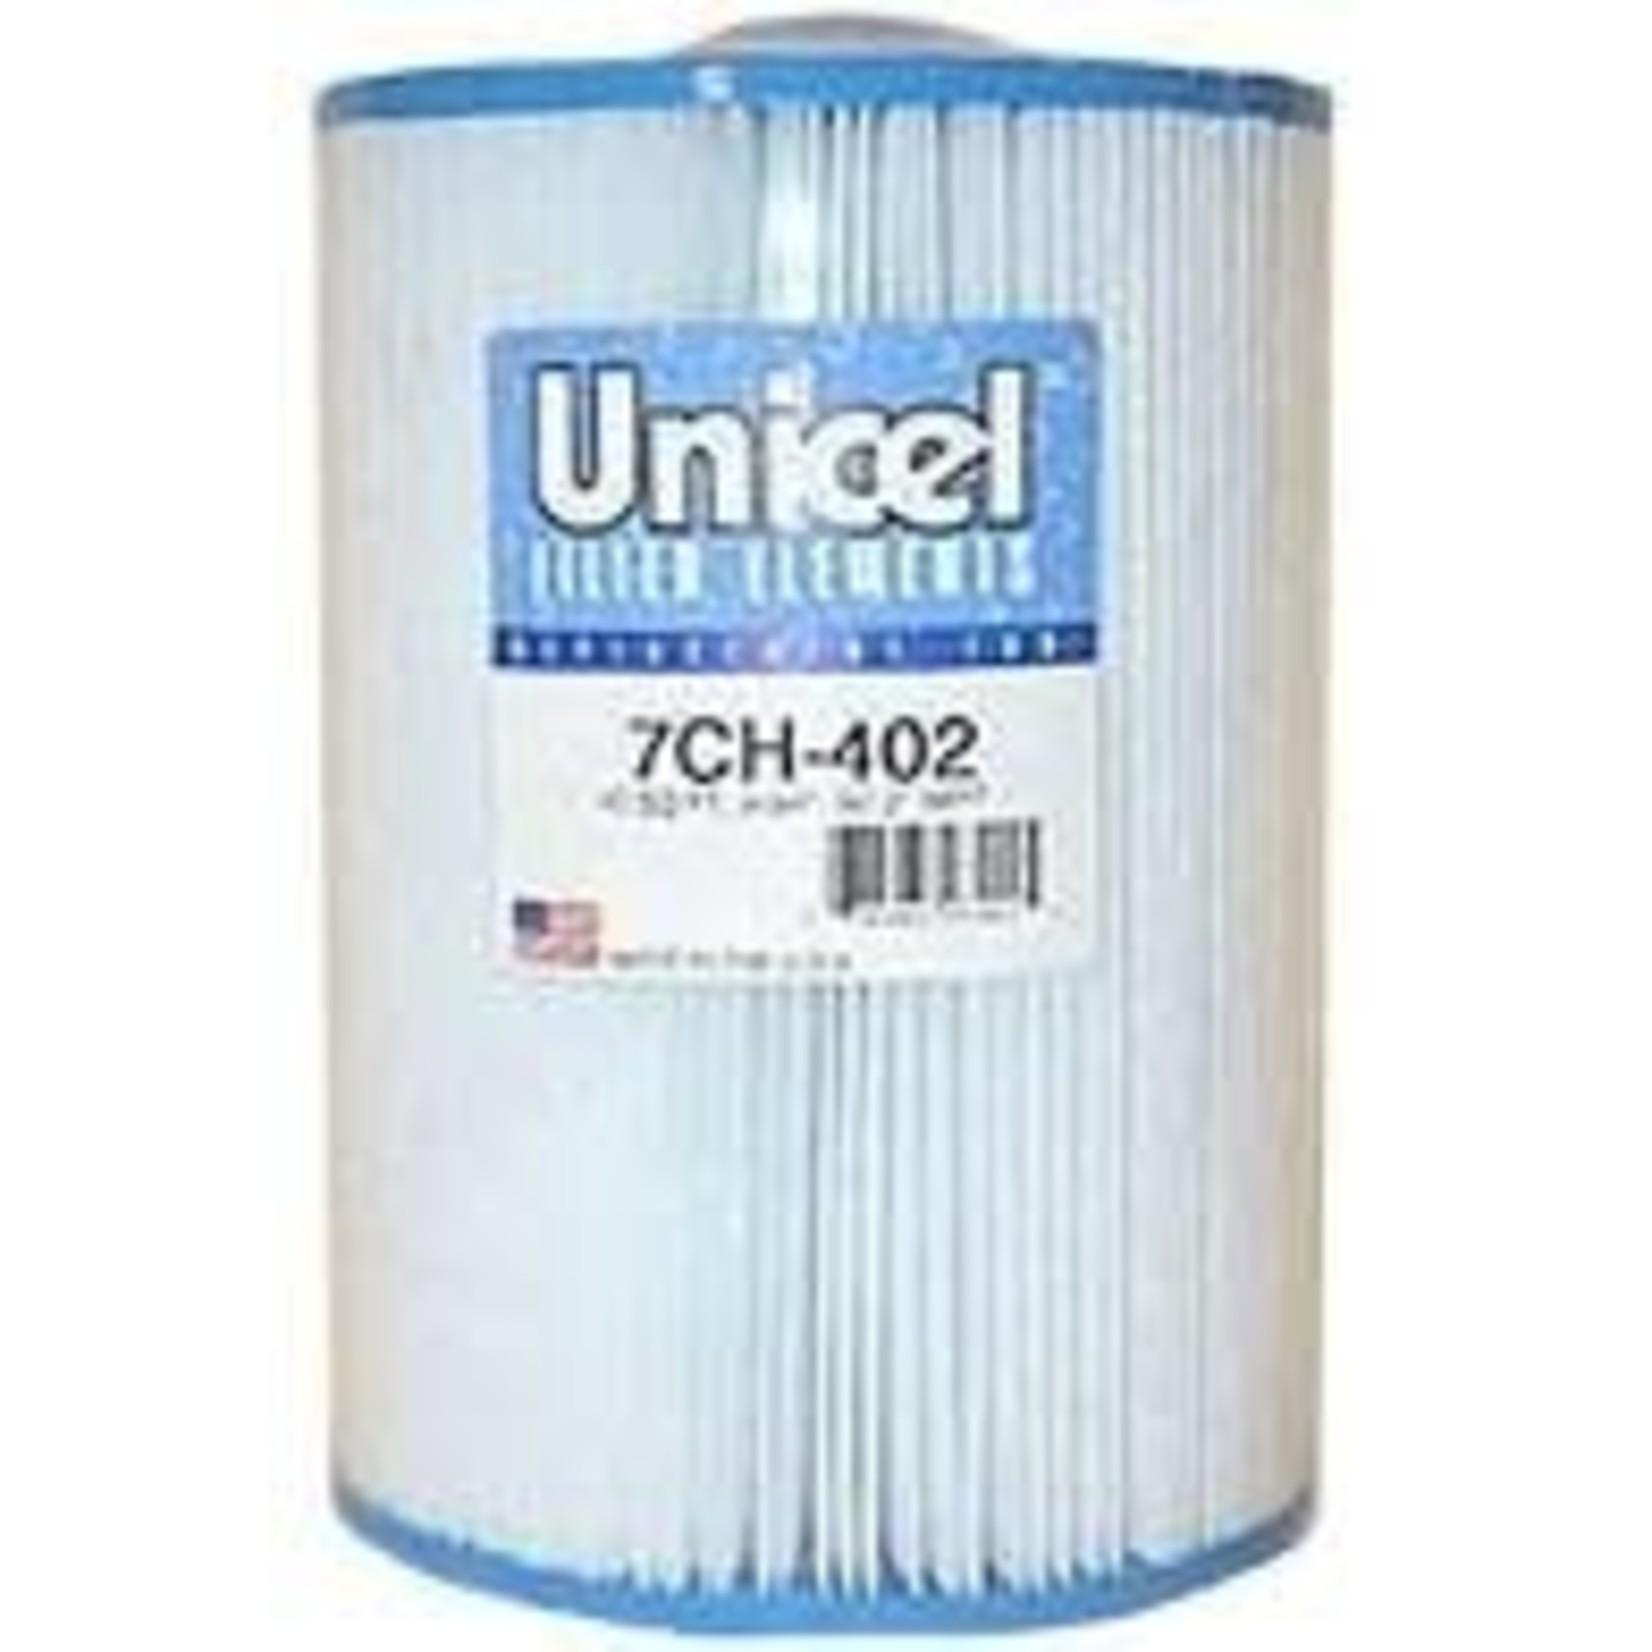 Unicel CARTRIDGE SPA 5CH-402